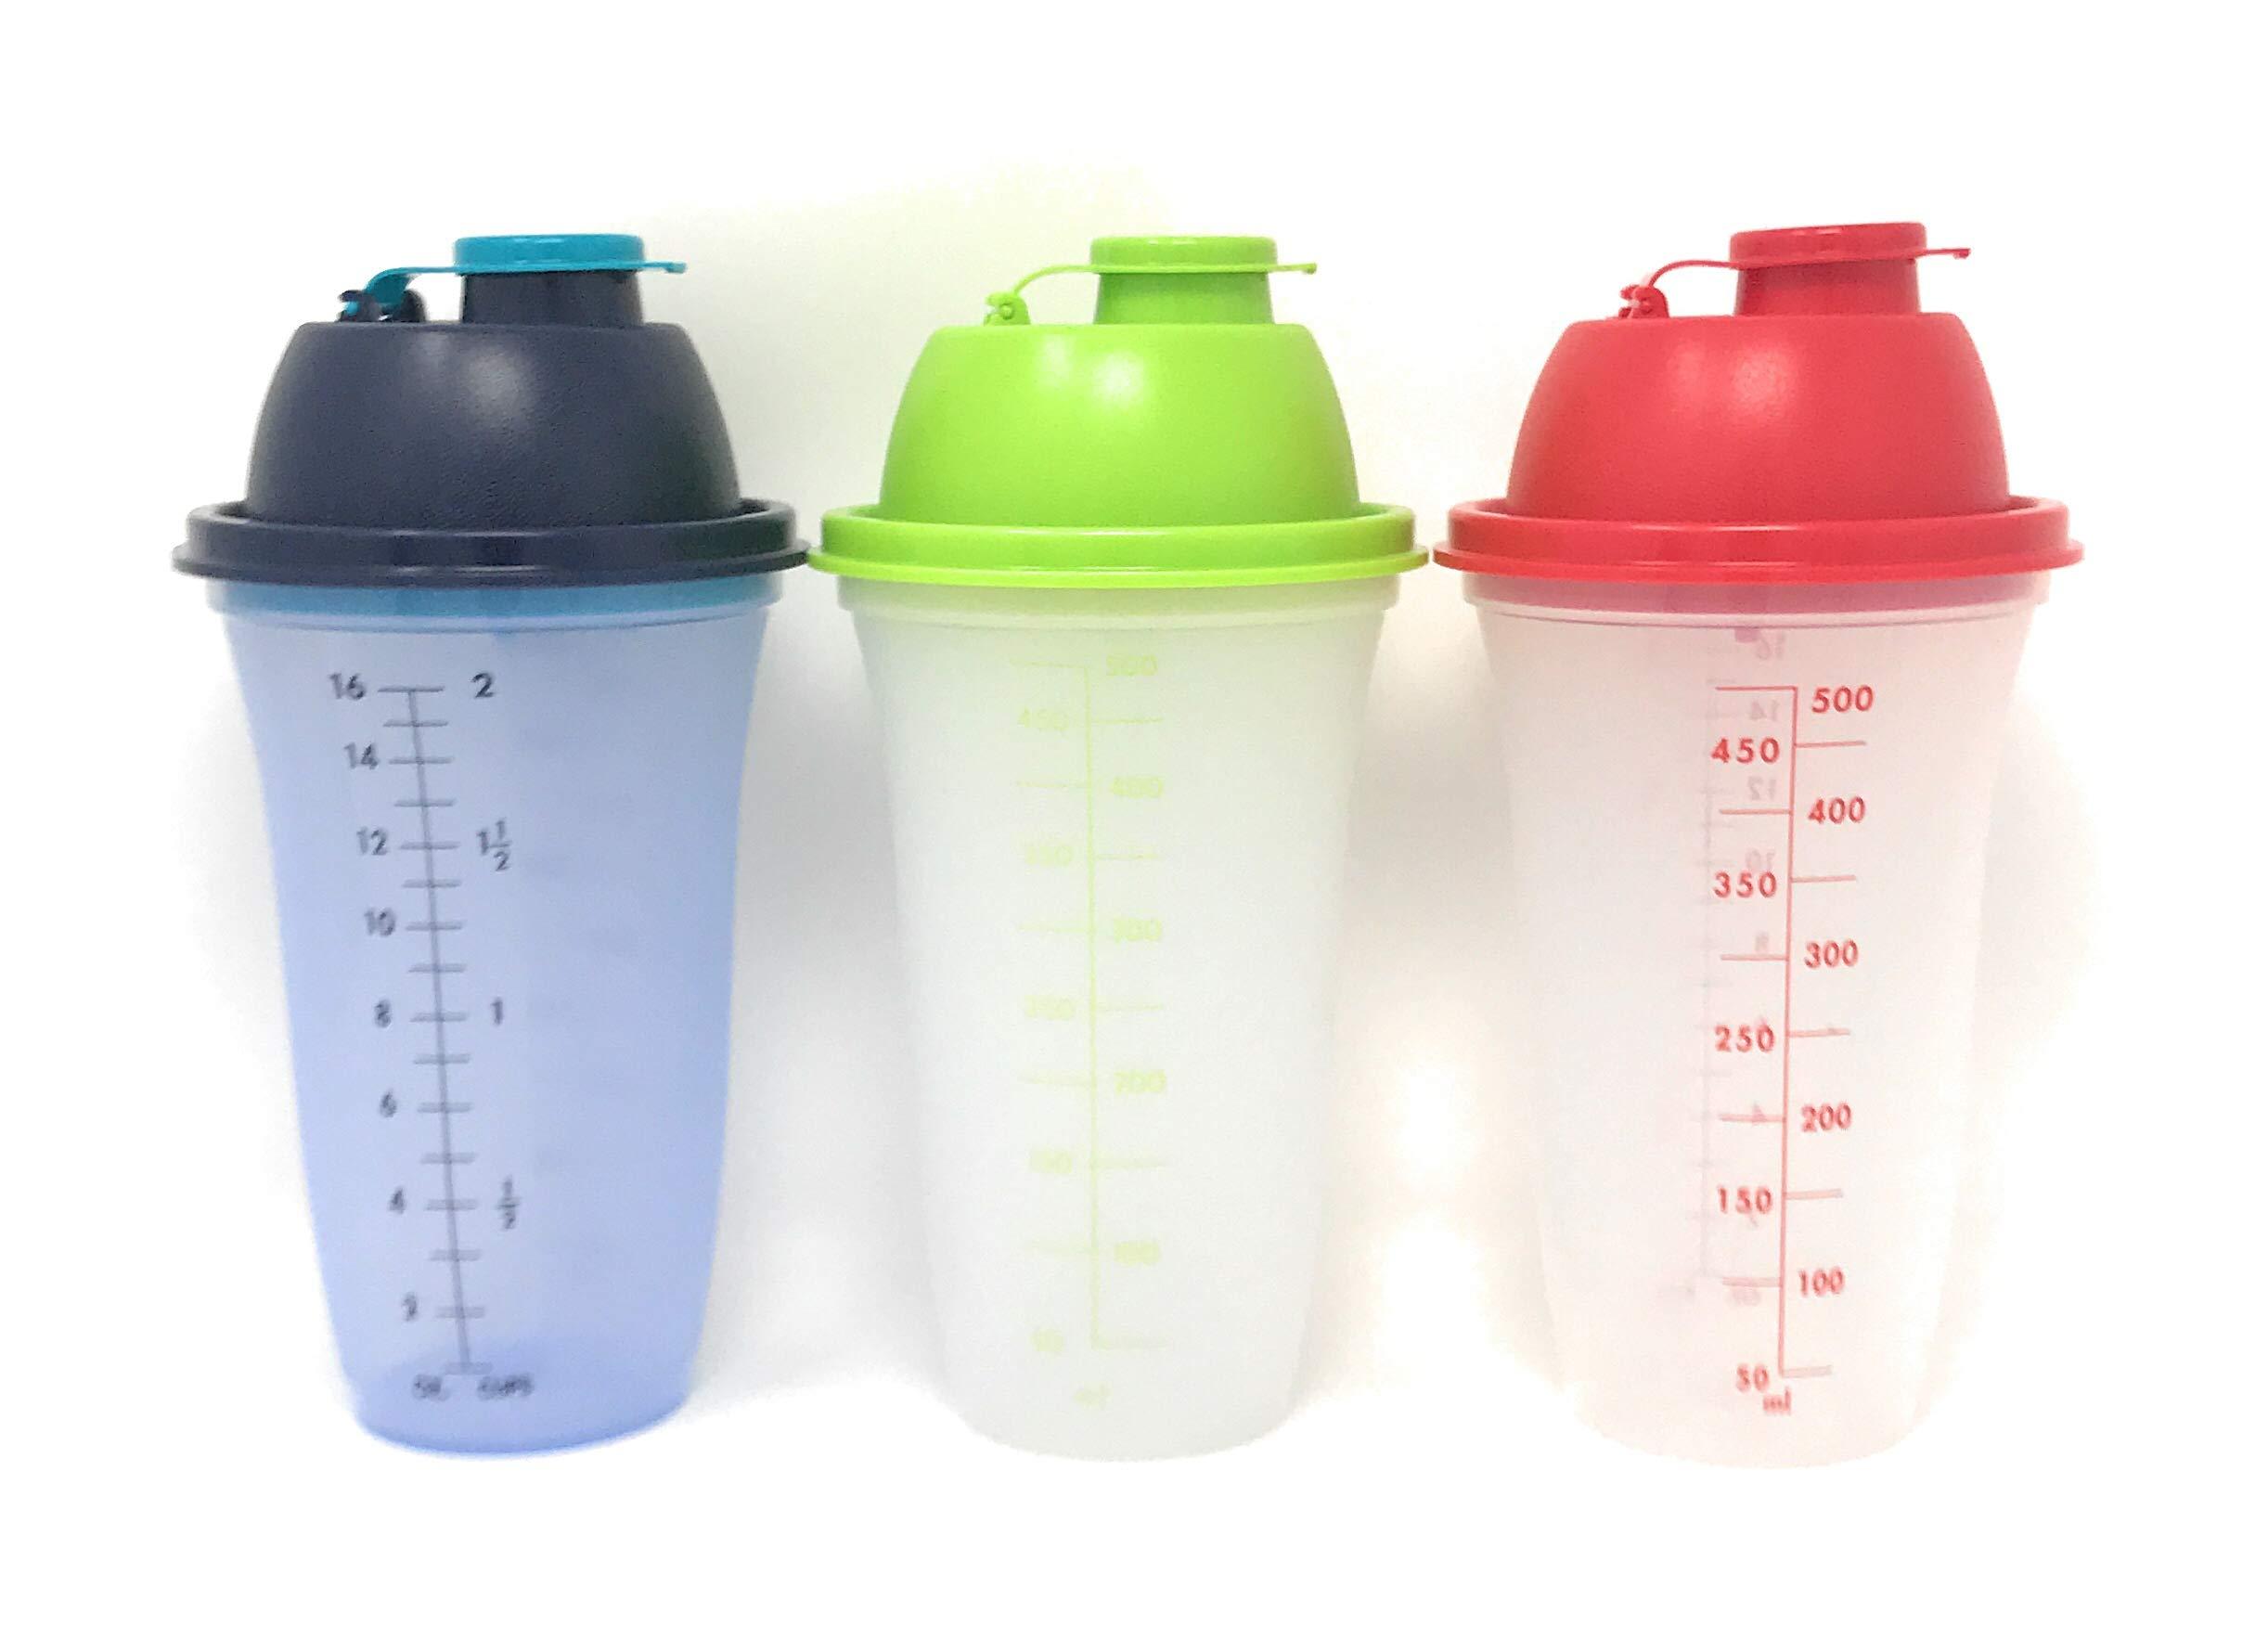 Tupperware Quick Shake Shaker Mixer Blender Colors Trio Set